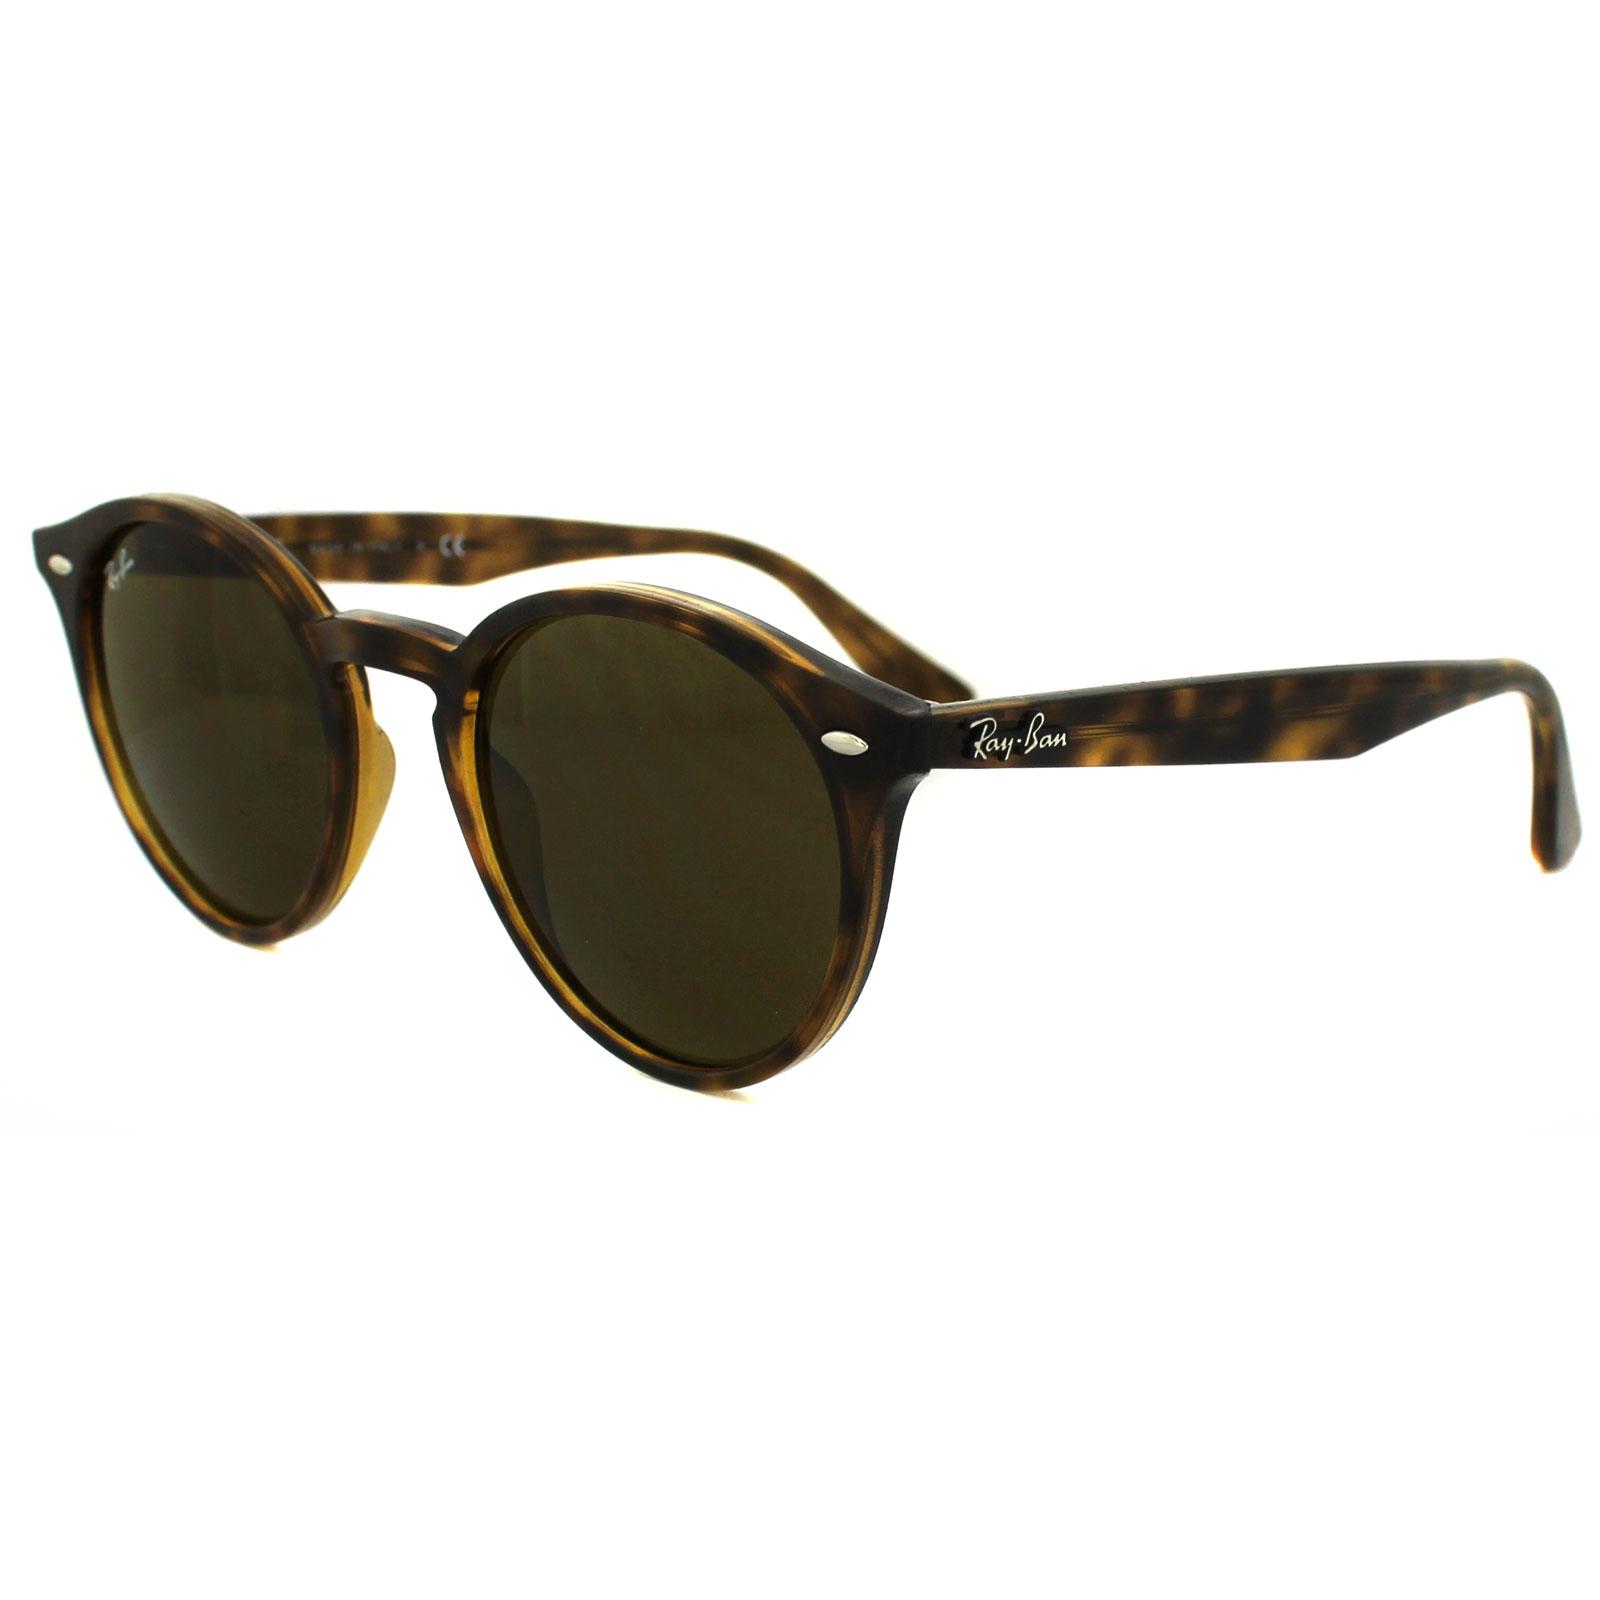 ray ban sunglasses 2180 710 73 tortoise brown b 15 ebay